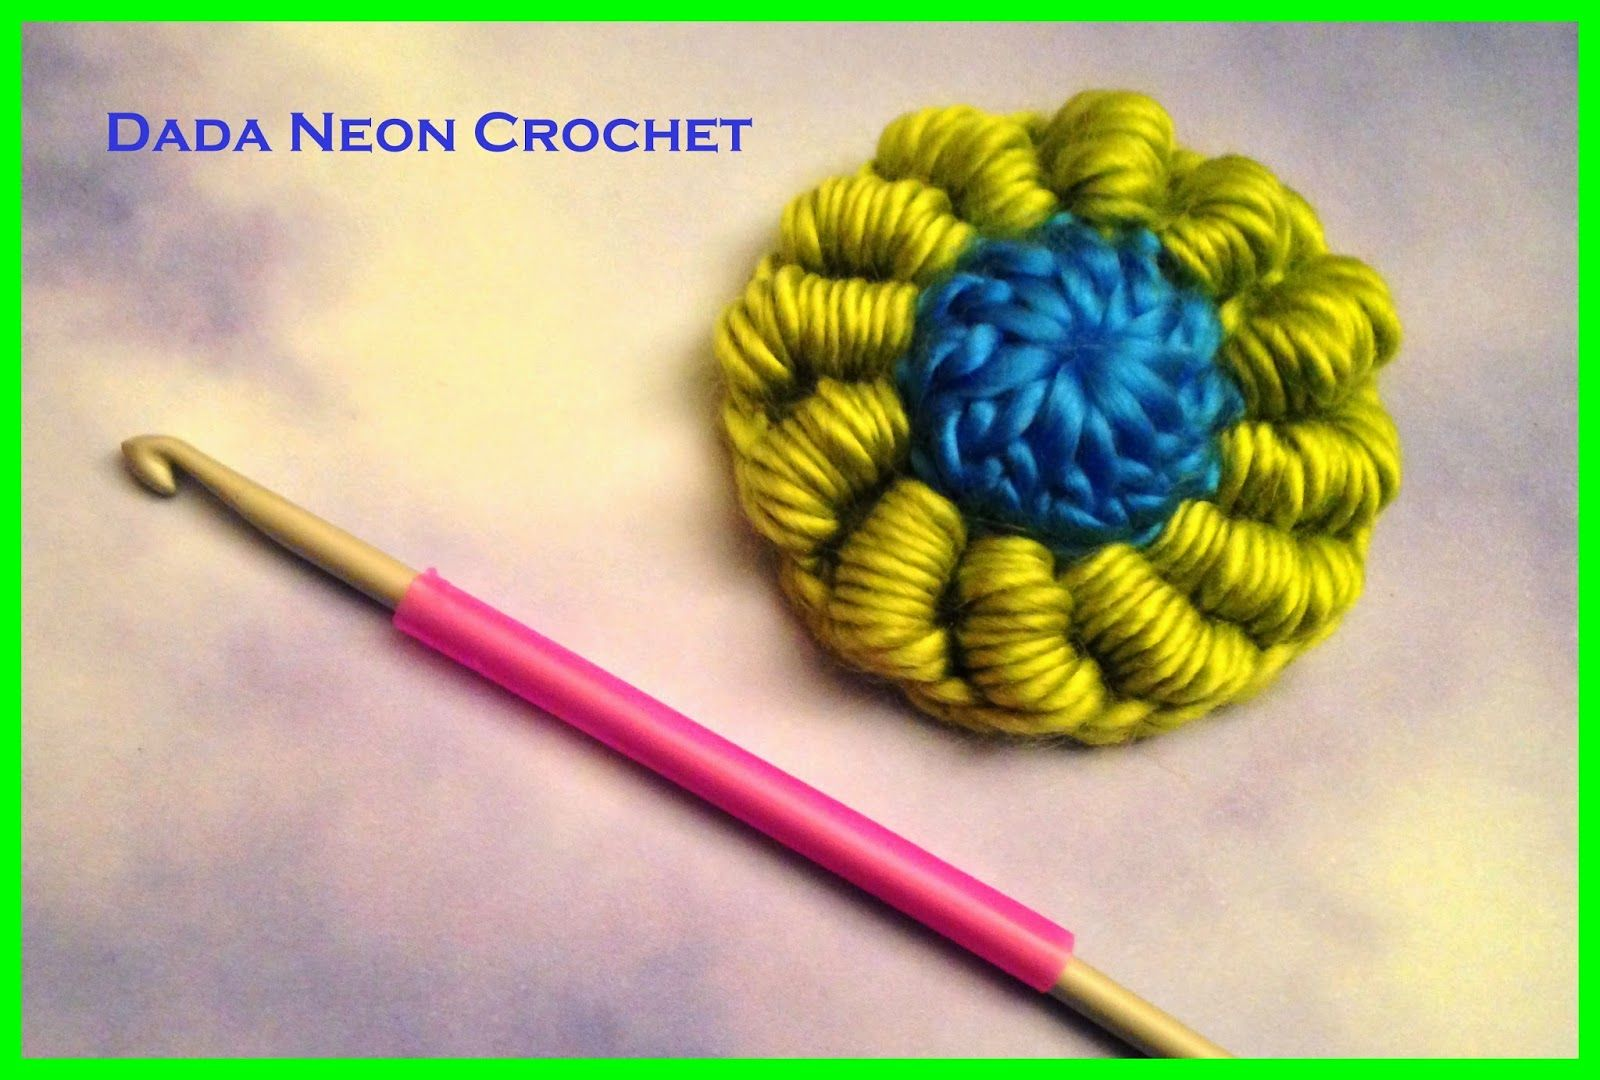 Dada neón Crochet: Lingotes Stitch Tutorial - Mi nuevo favorito crochet puntada!